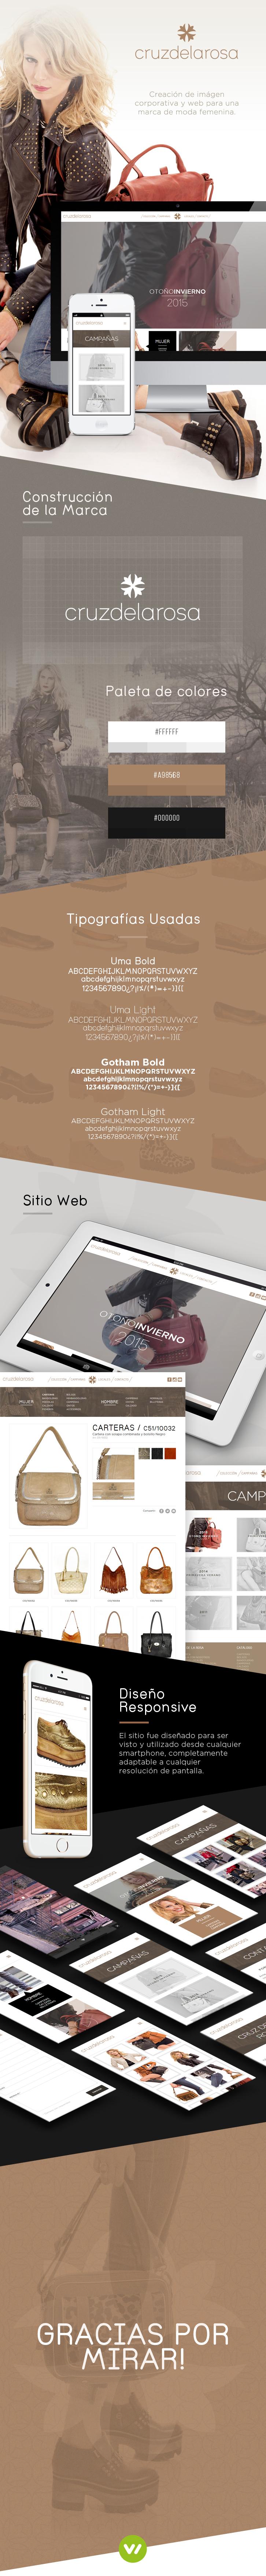 Sitio web de ropa